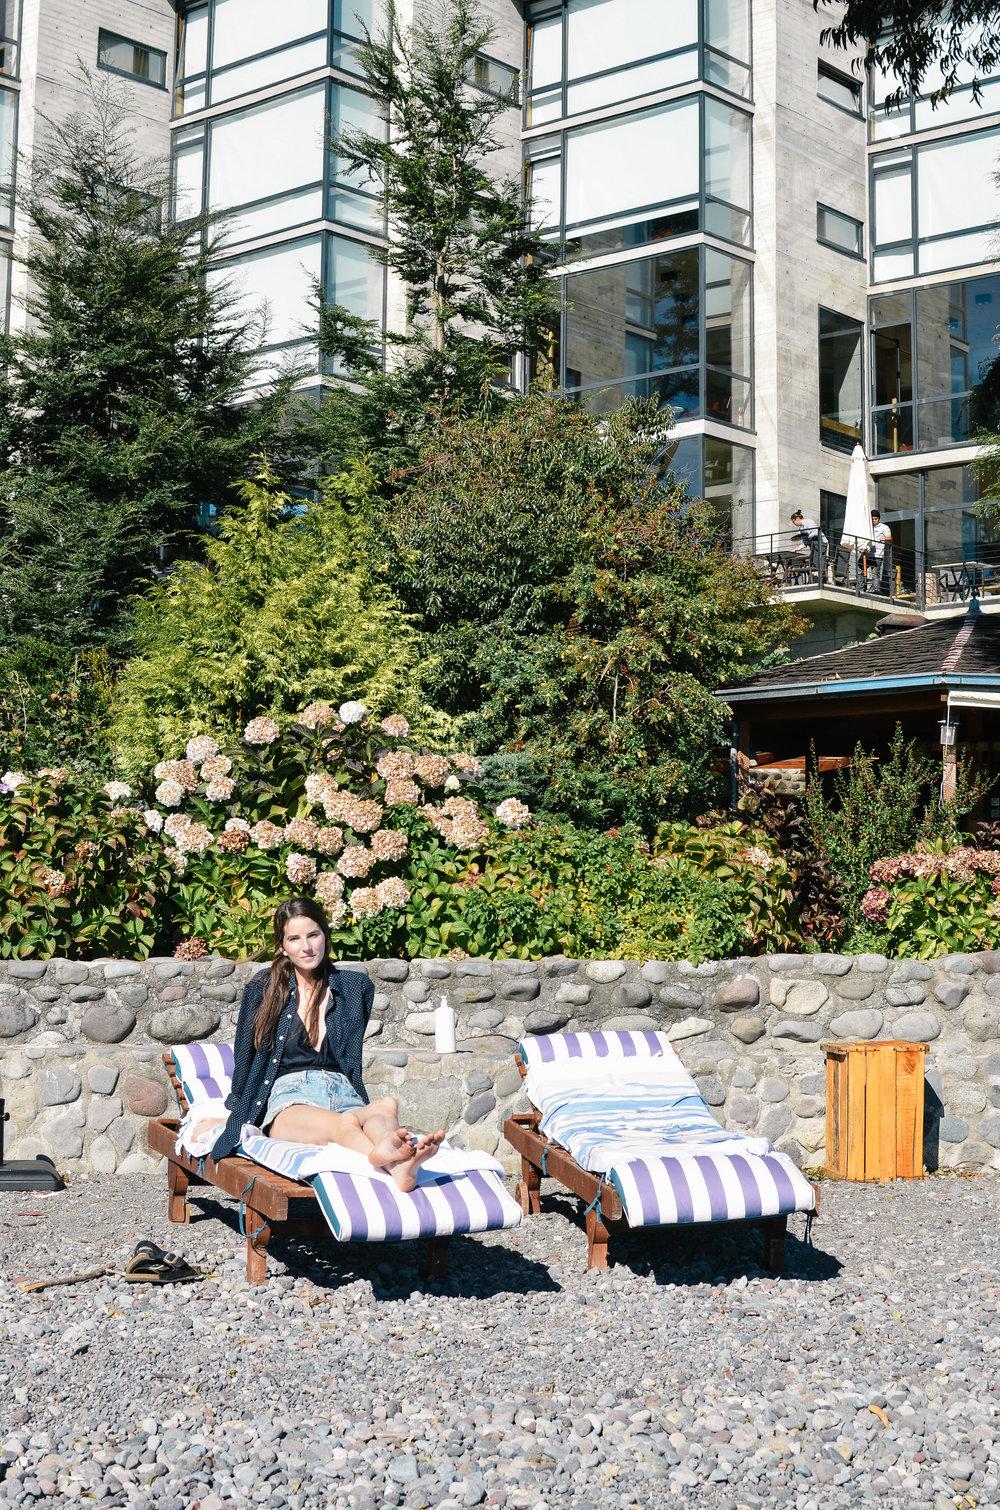 chile+awa+hotel+travel+guide+life+on+pine_DSC_1391.jpg